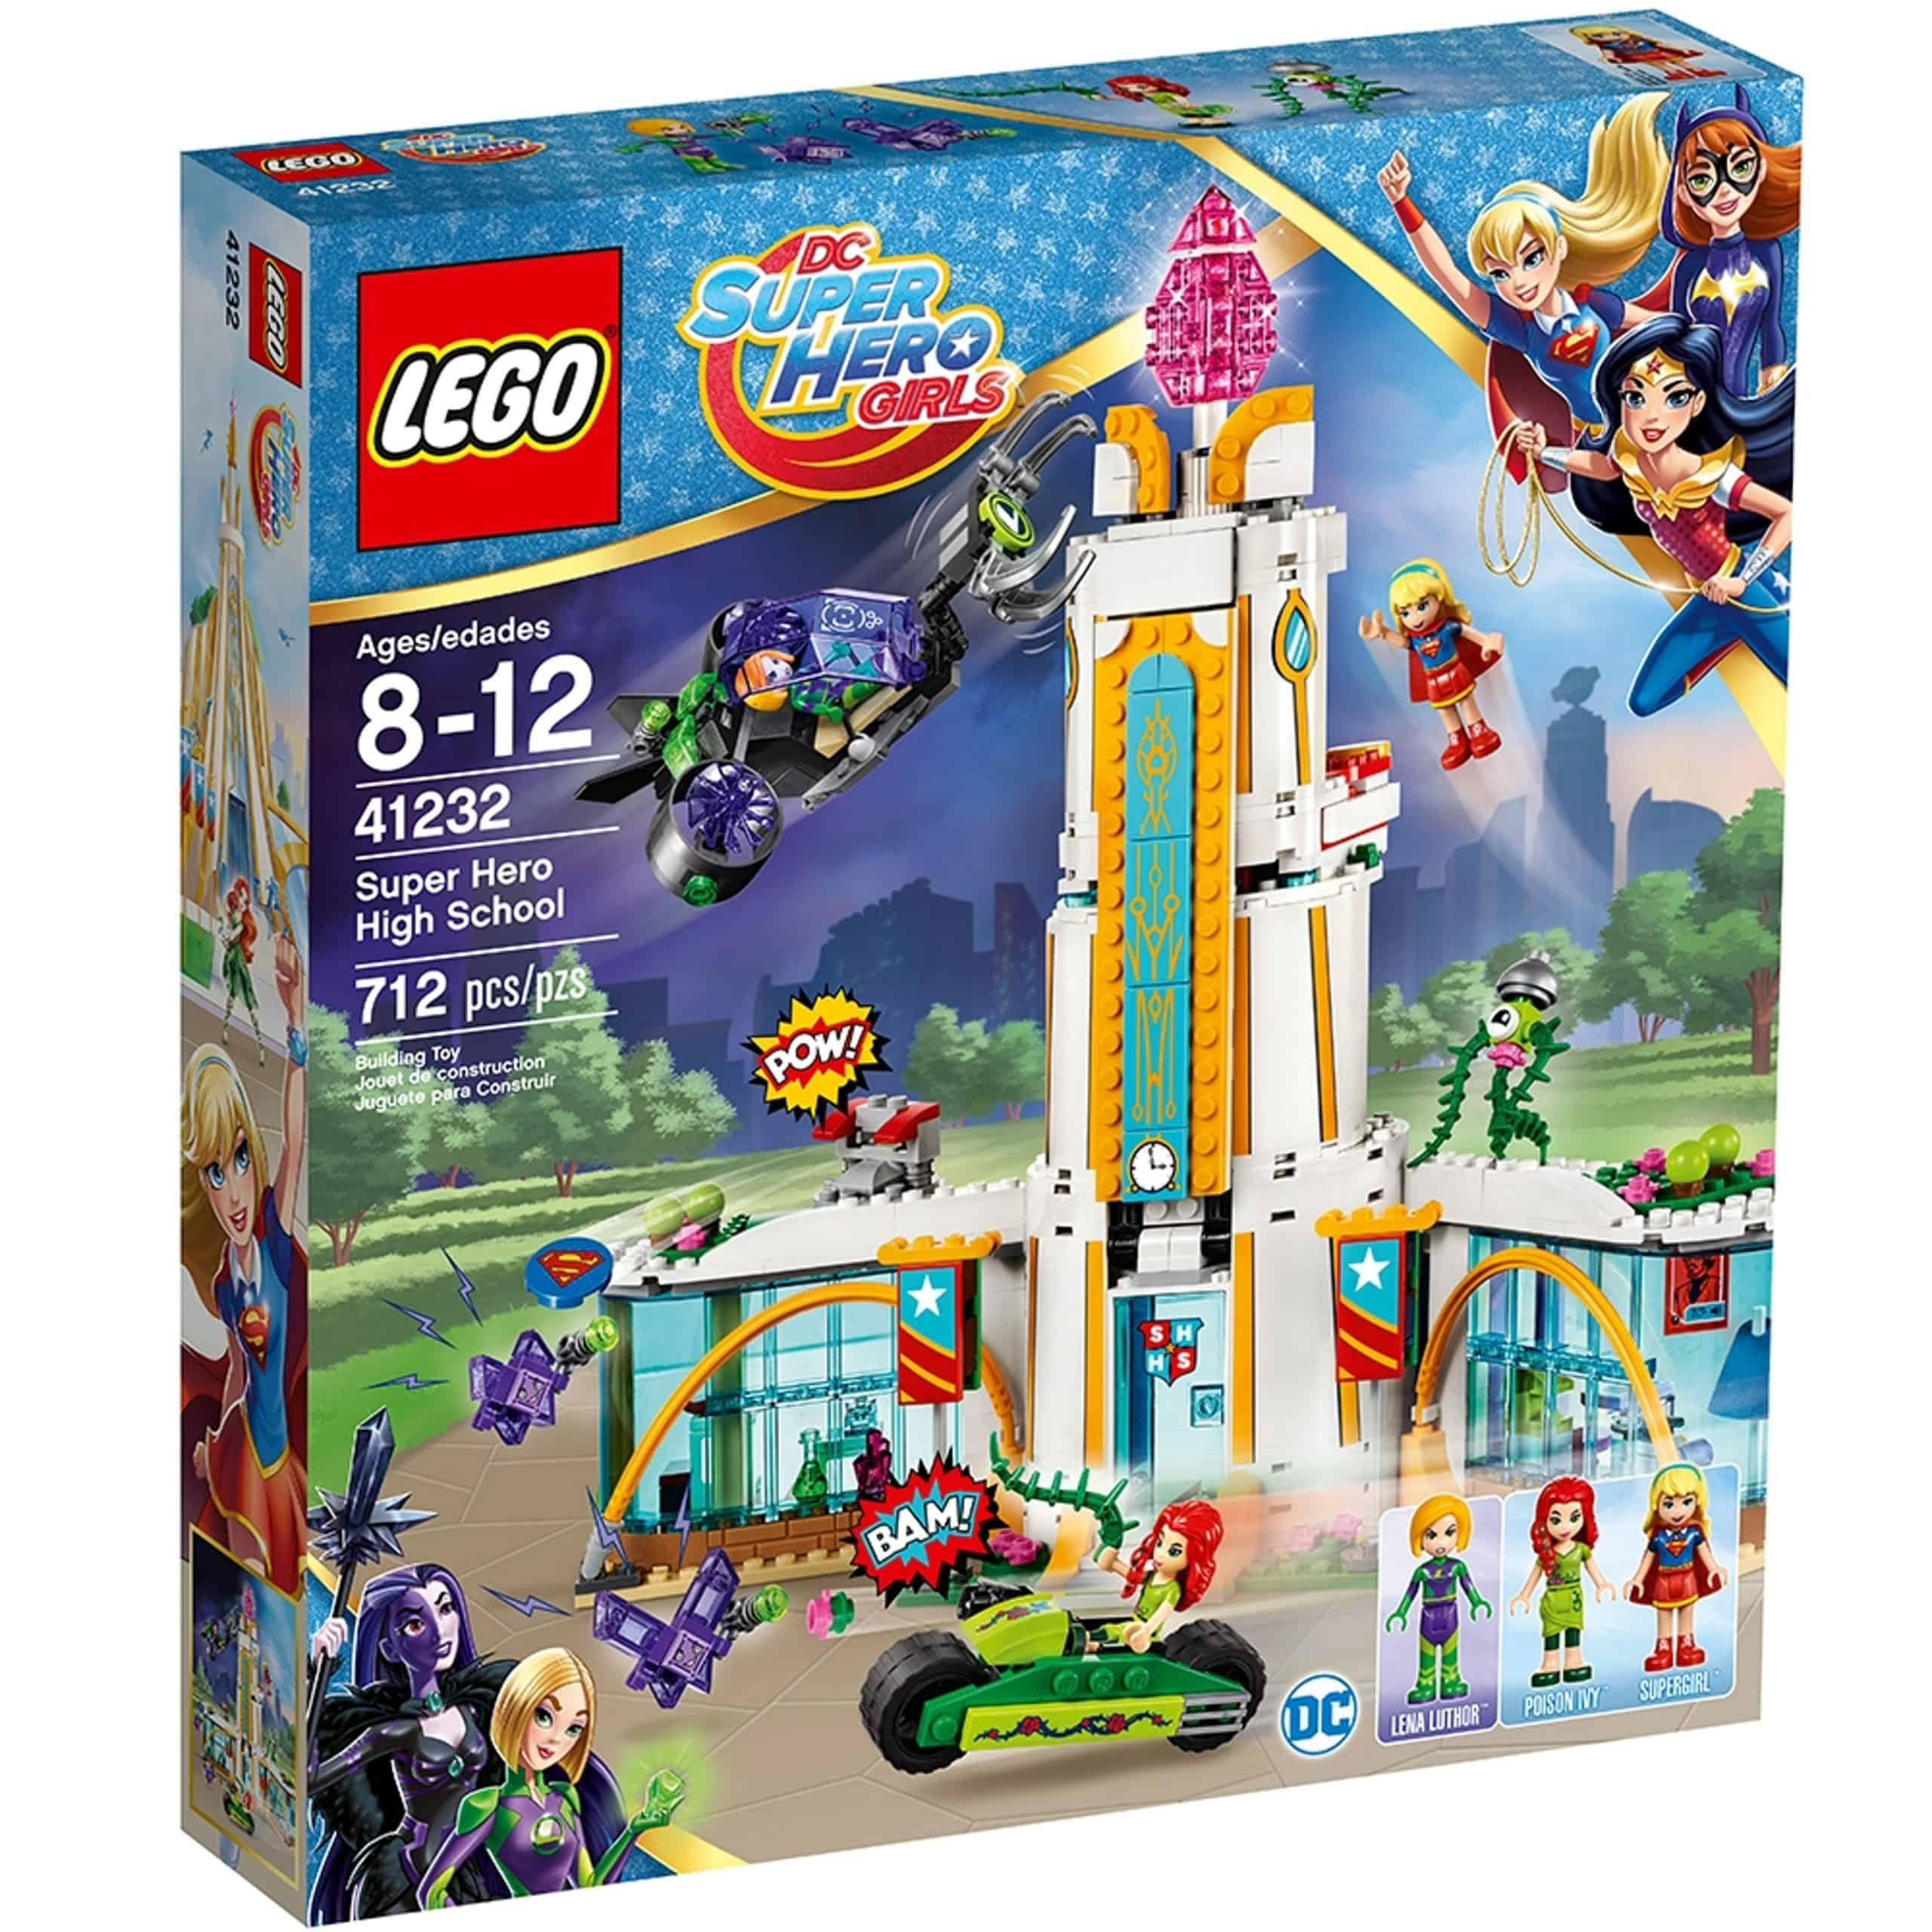 lego 41232 highschool der super heroes scaled